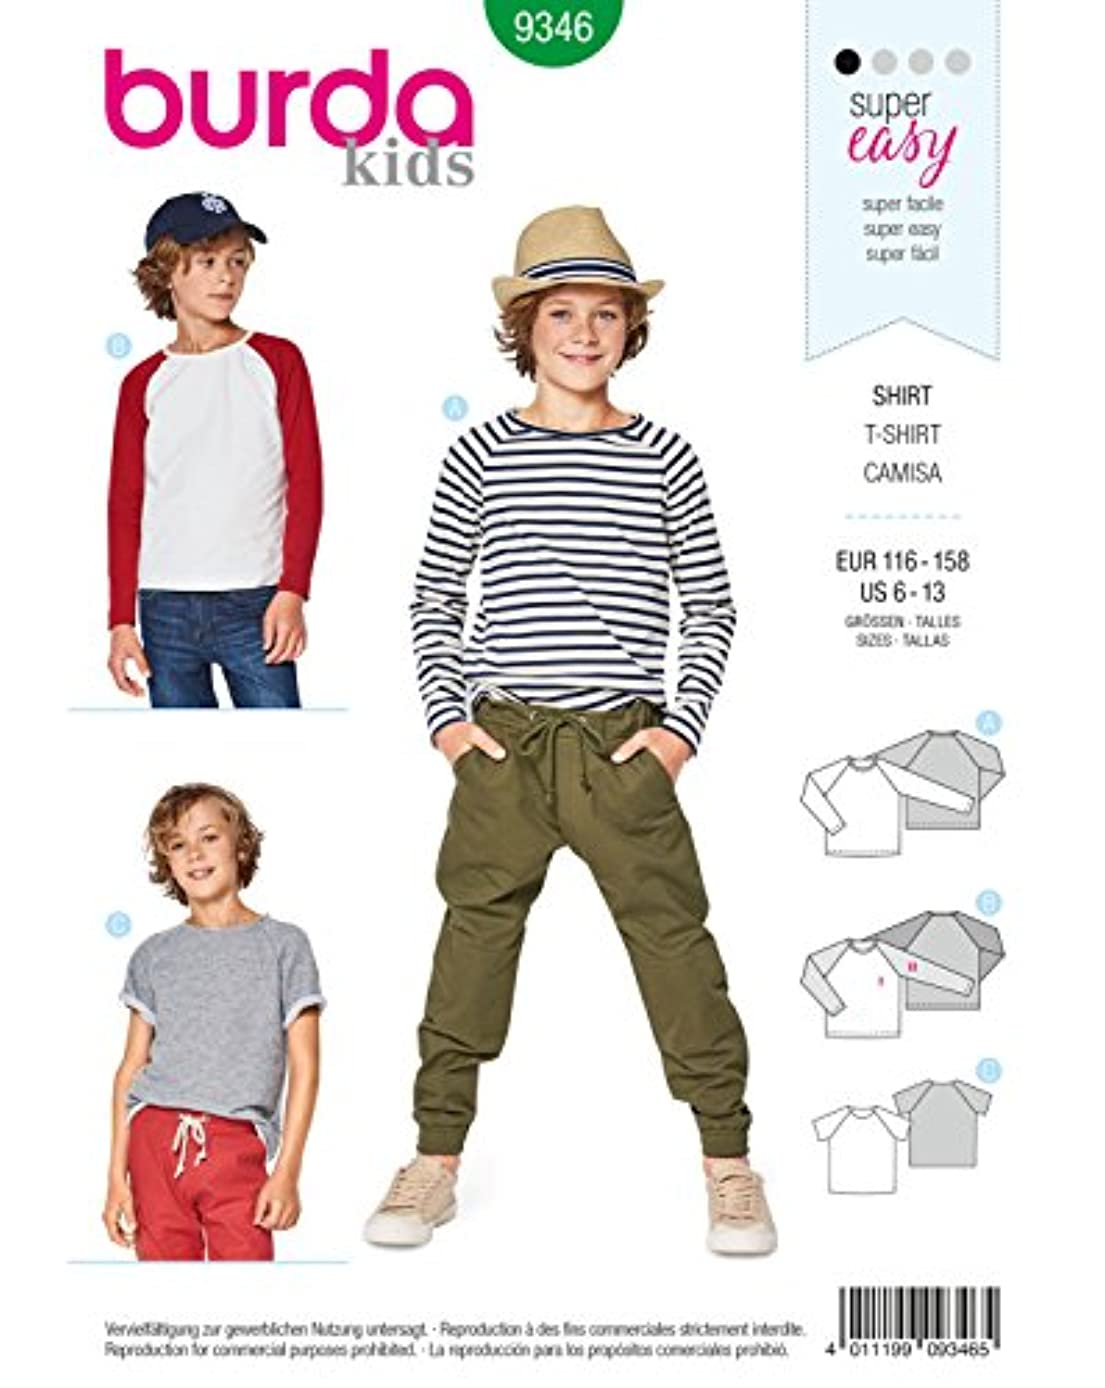 Burda Style Sewing Pattern B9346 - Child's Raglan Tops, A(6-7-8-9-10-11-12-13)